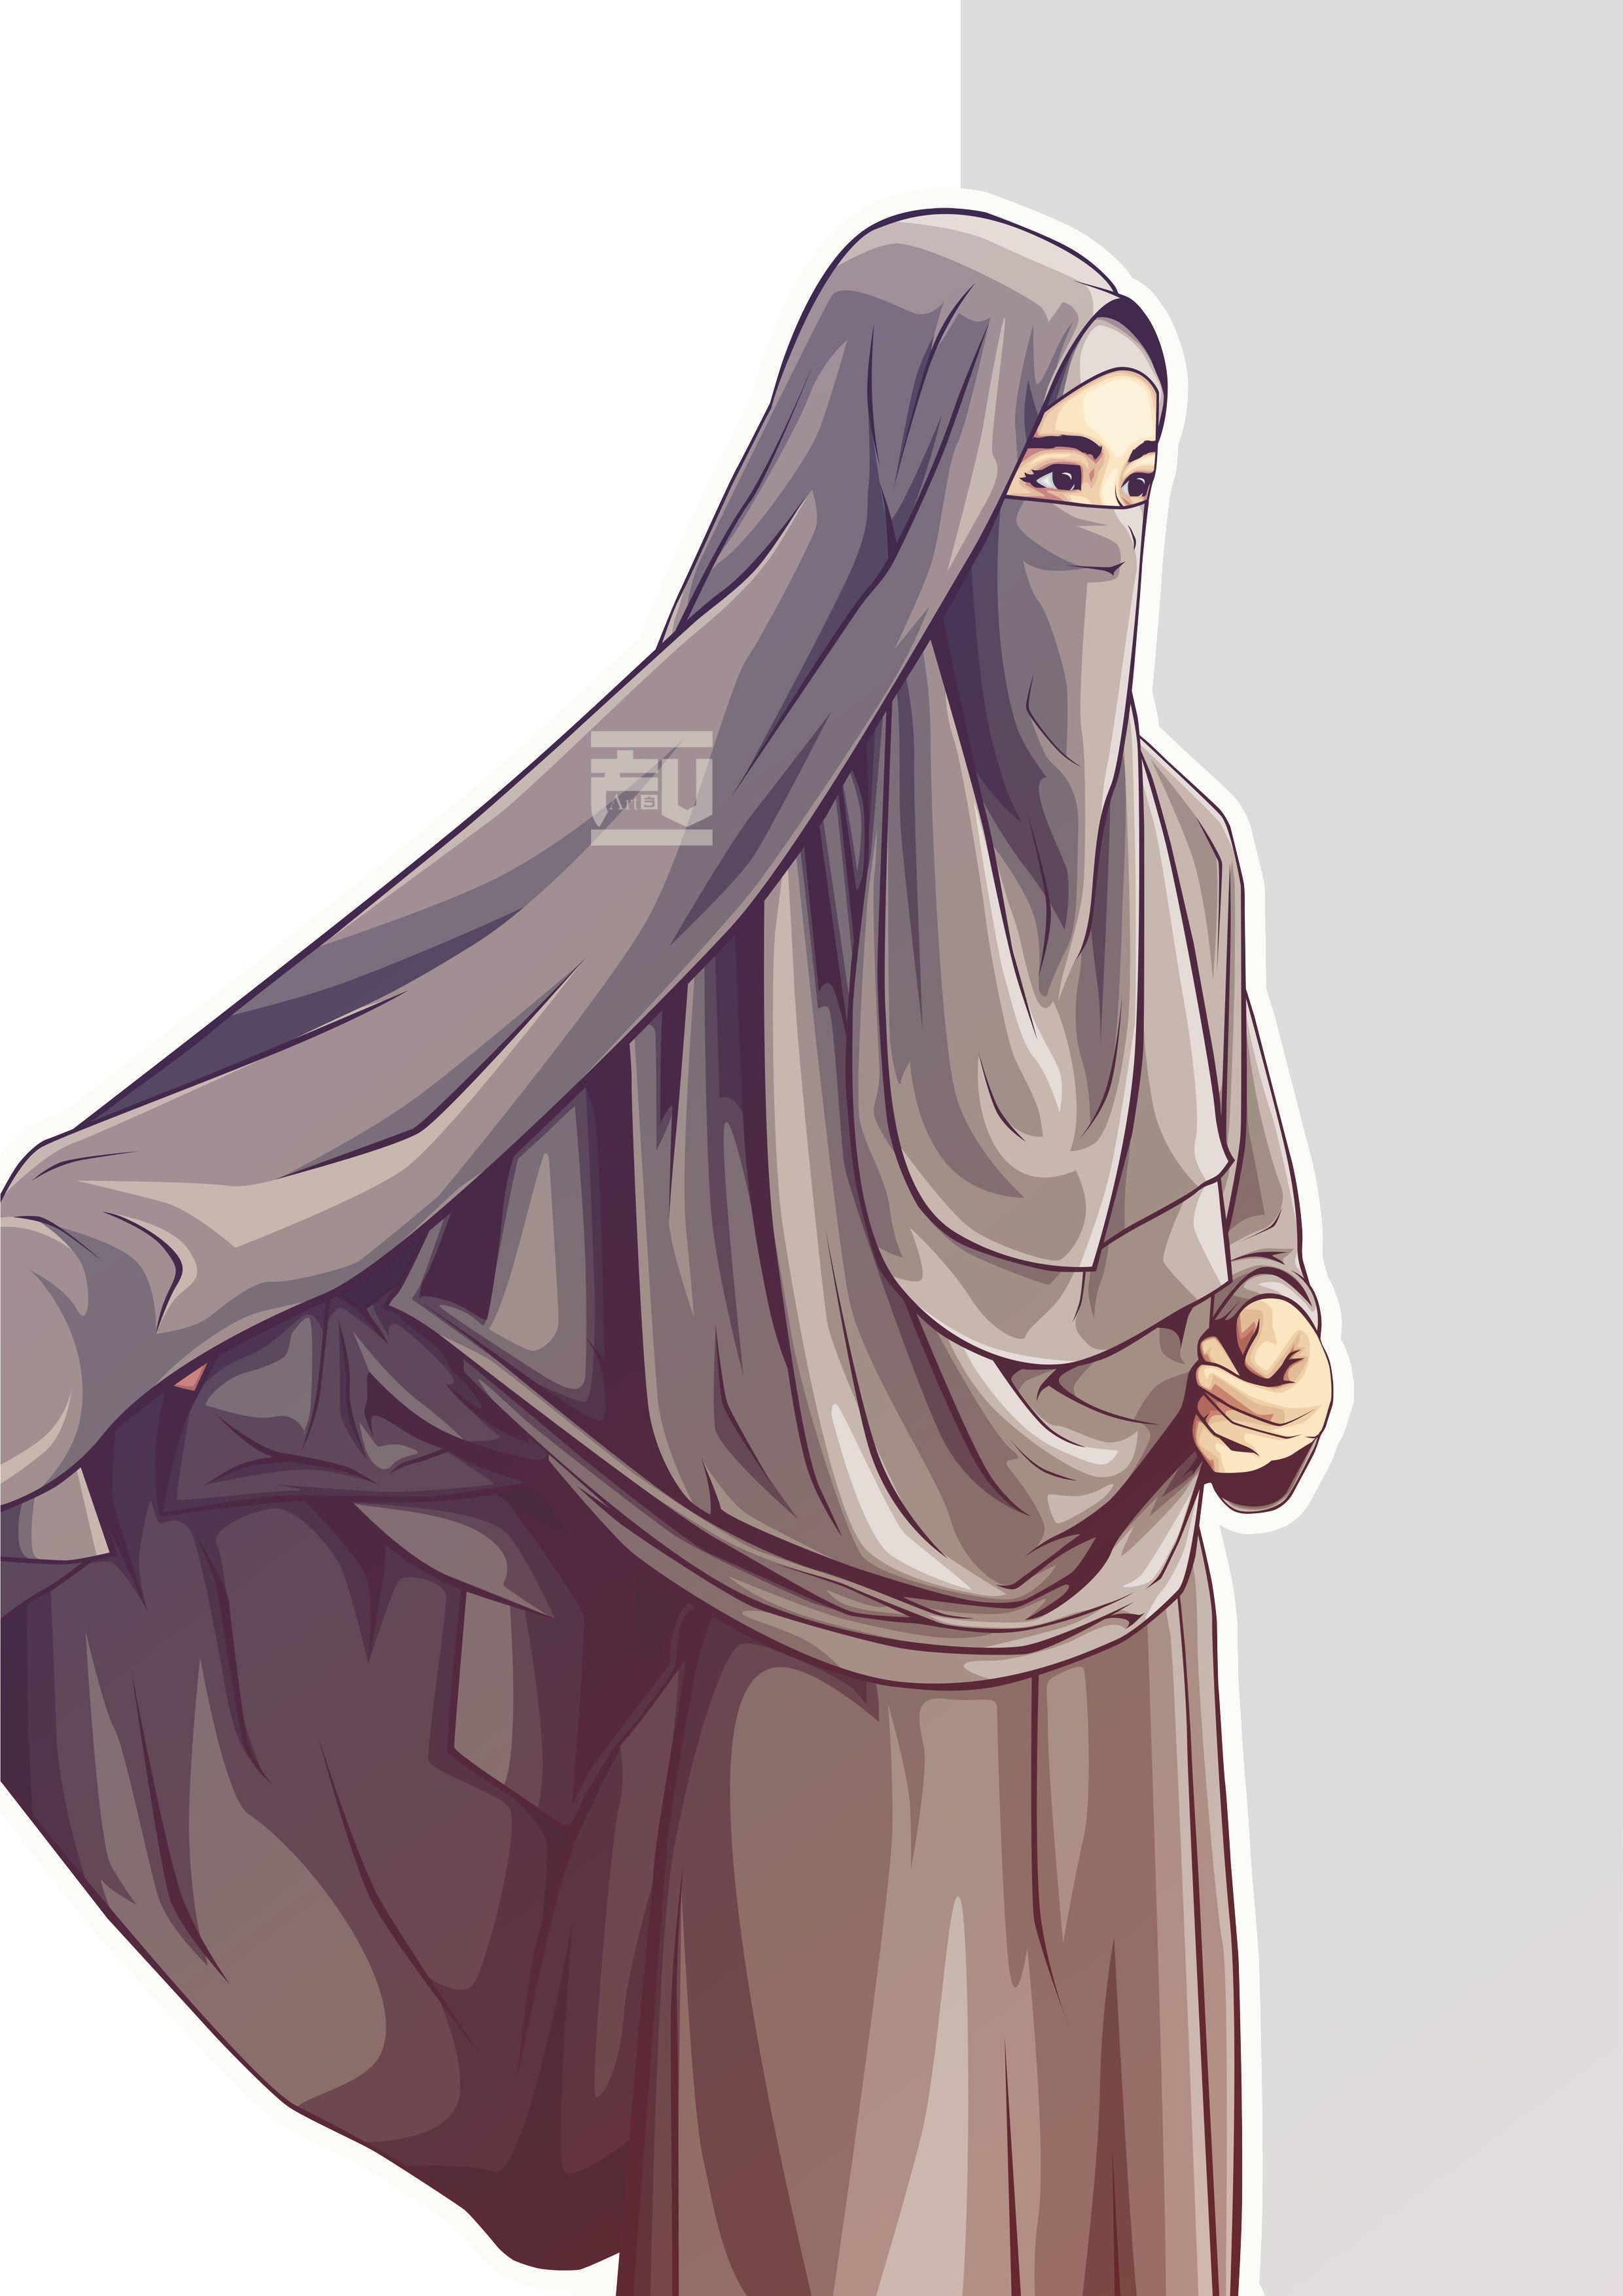 ♥Hɪᴊᴀʙ Gɪʀʟ♥ in 2020 Hijab cartoon, Anime muslimah